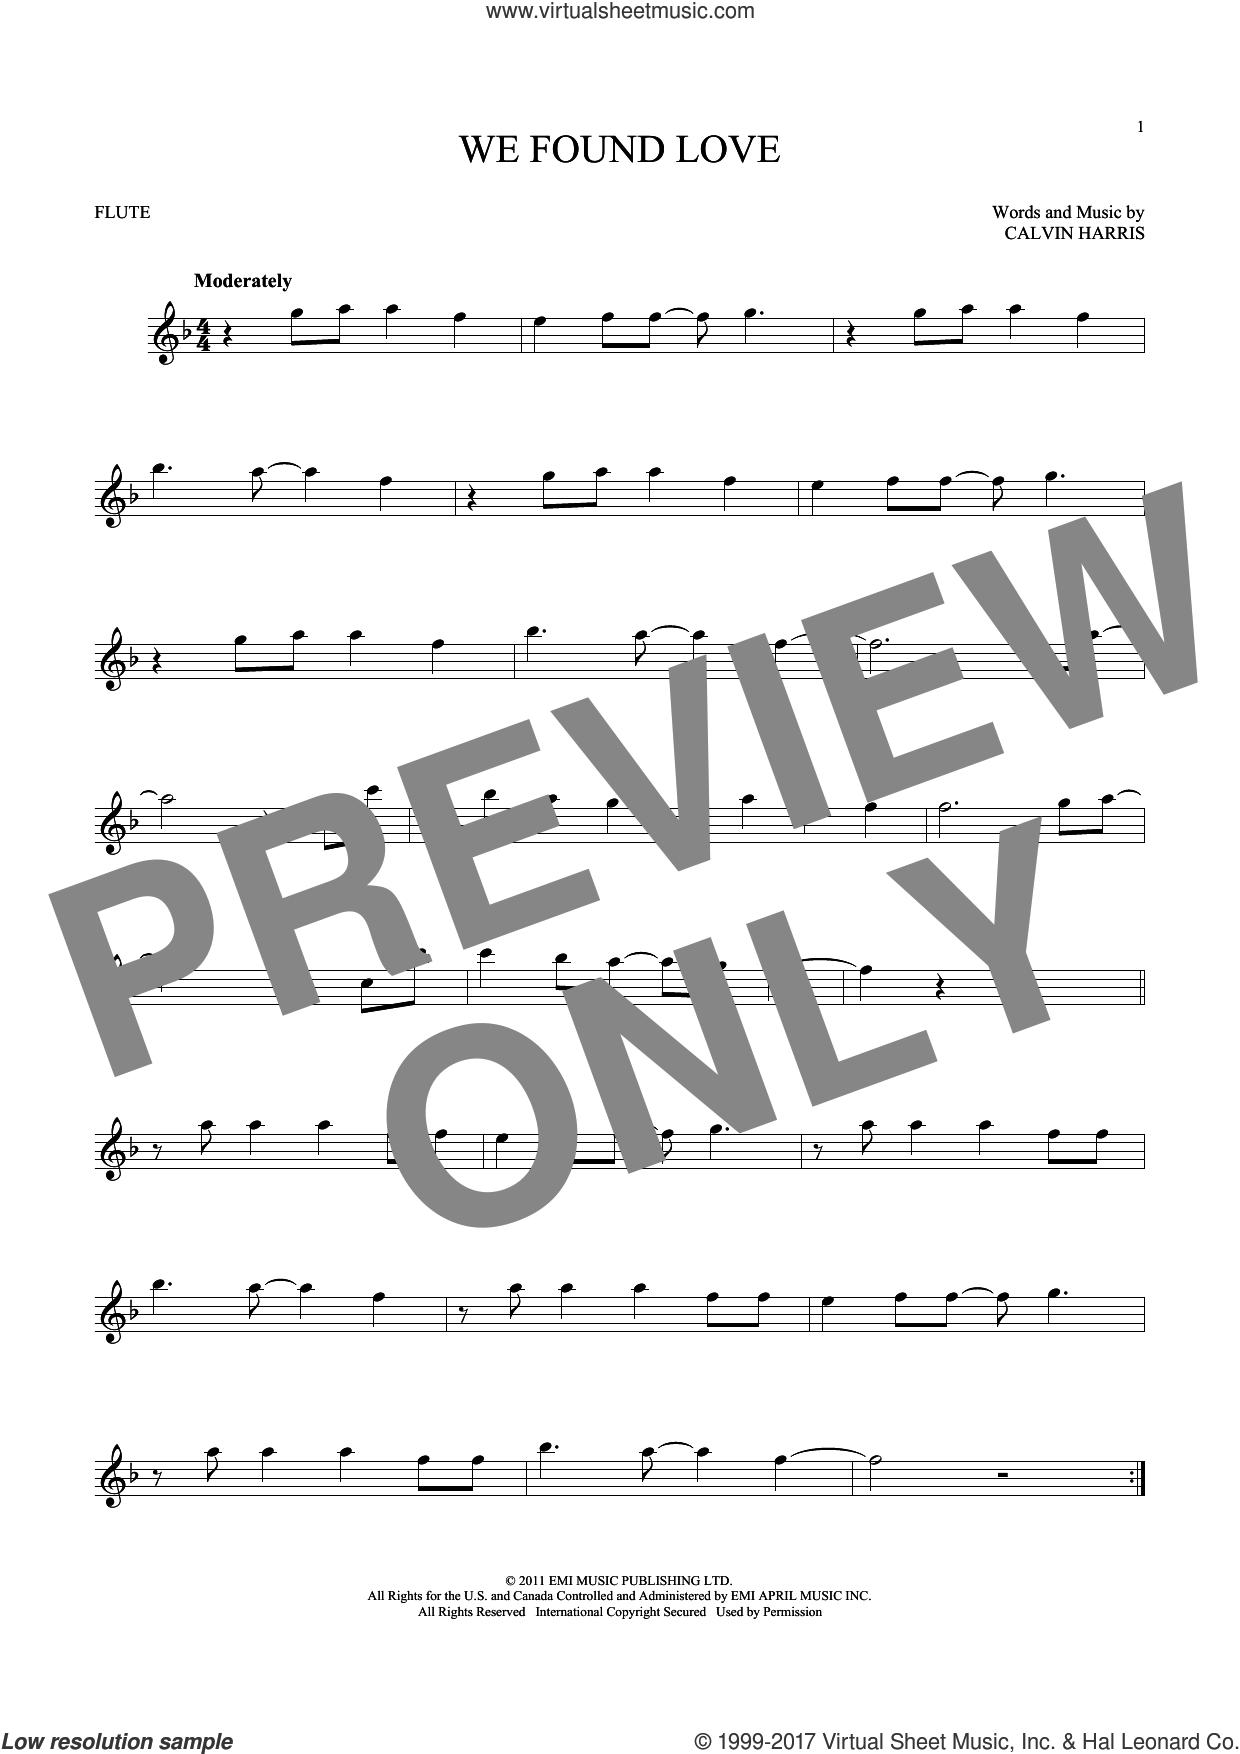 We Found Love sheet music for flute solo by Rihanna featuring Calvin Harris and Calvin Harris, wedding score, intermediate skill level